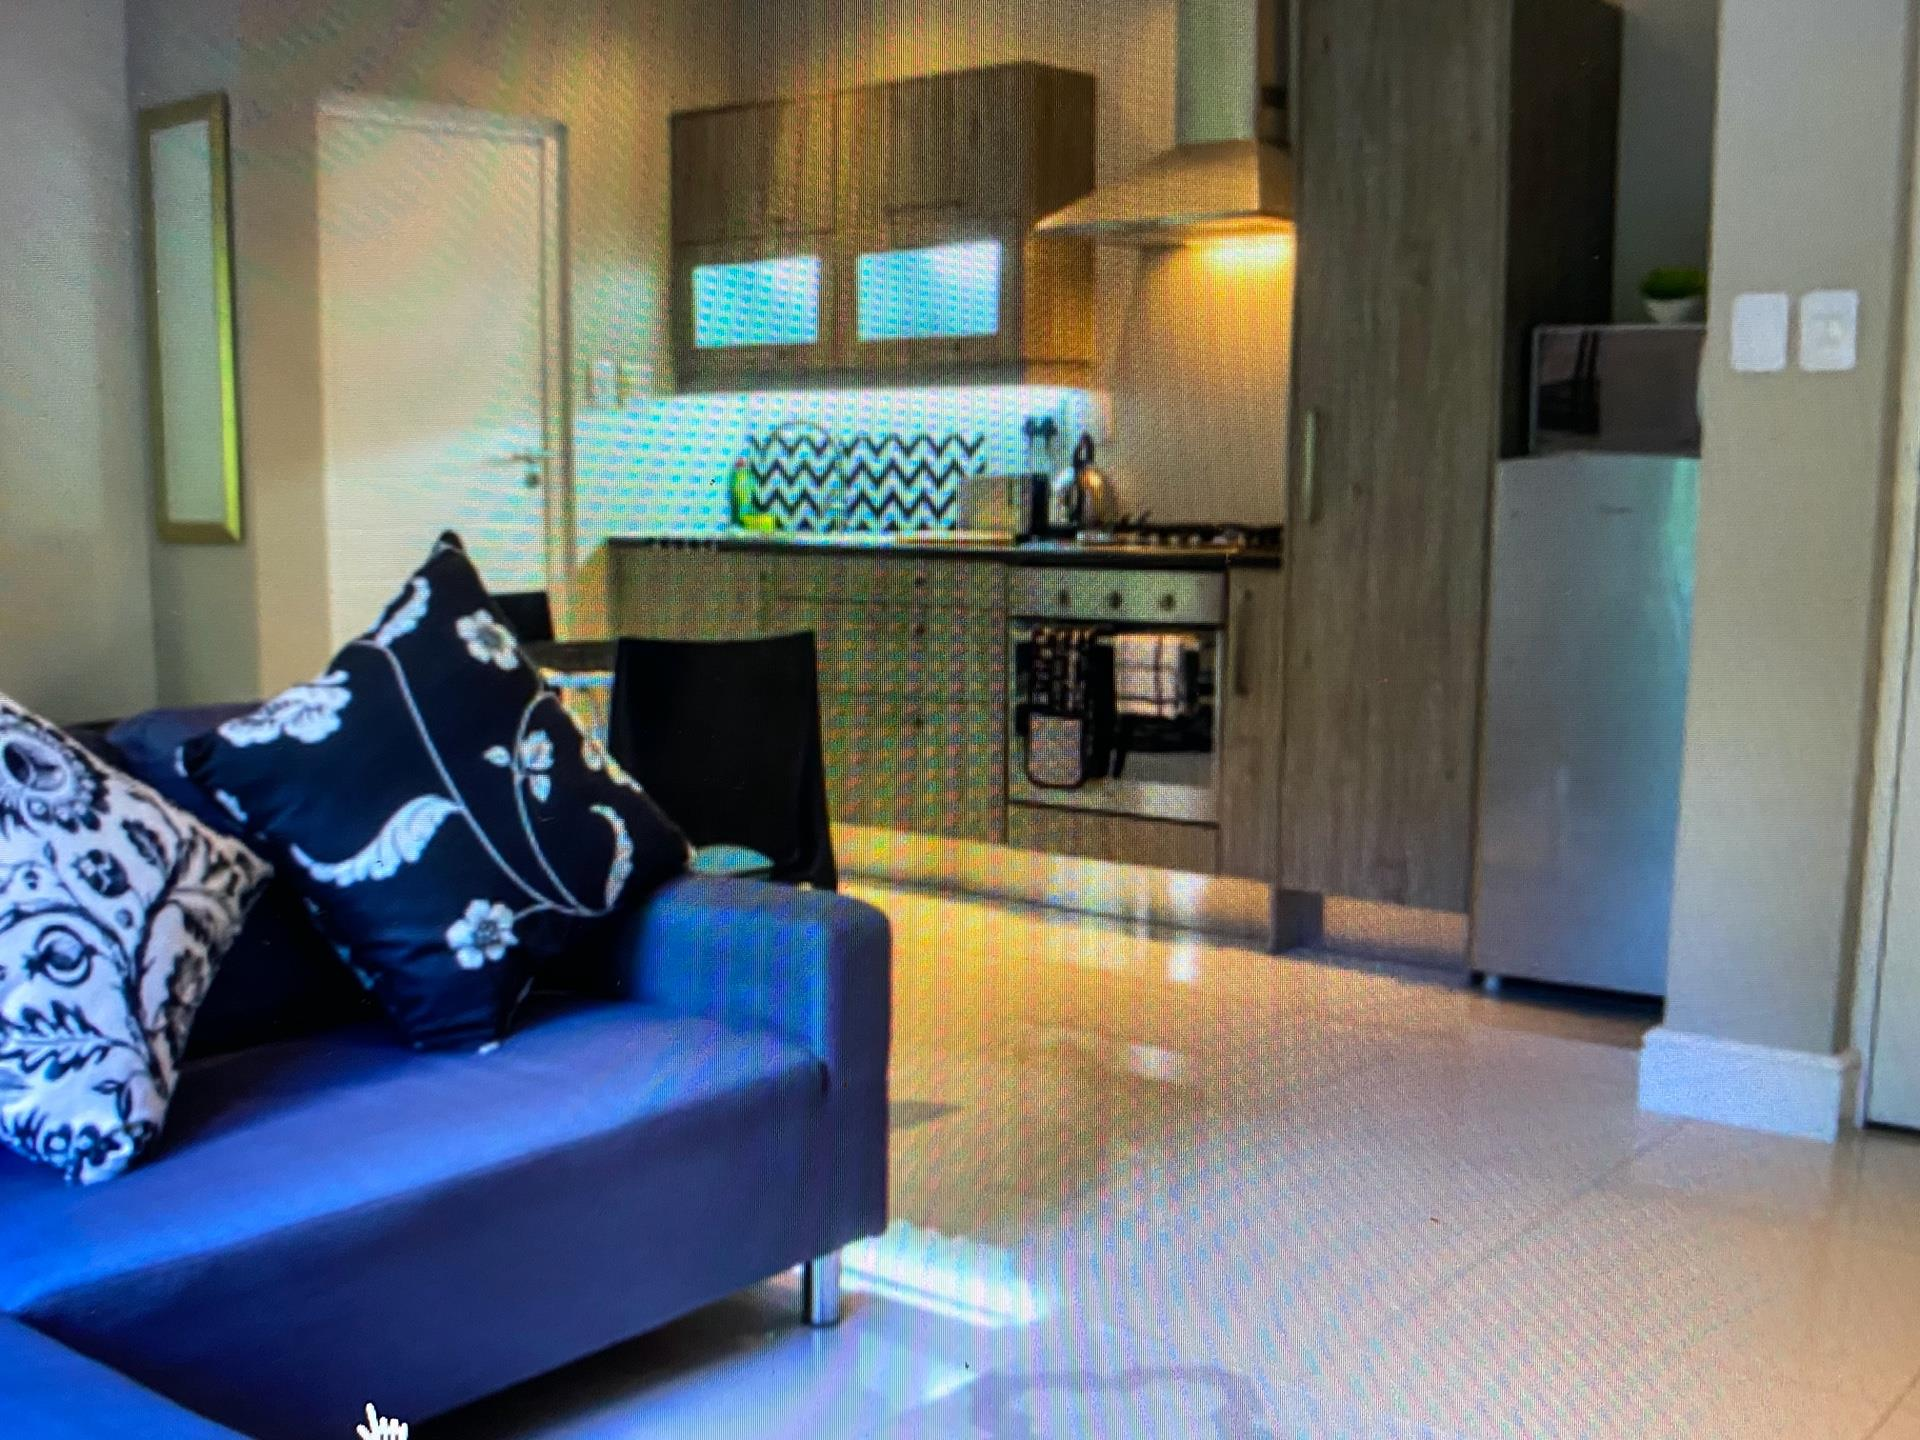 Commercial Property in Franschhoek For Sale